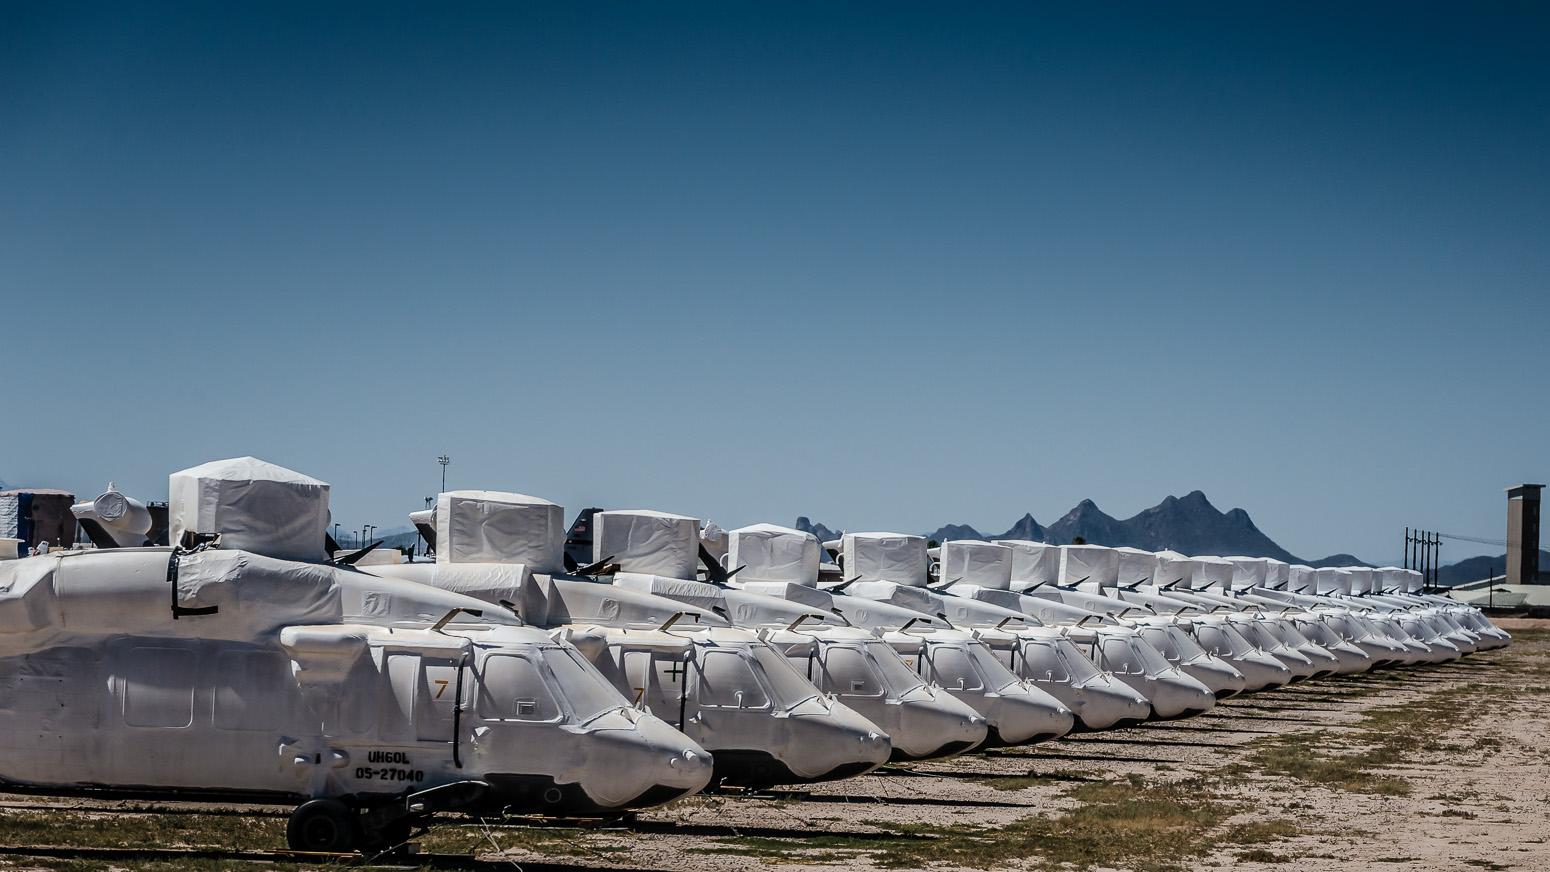 Sikorsky SH-60B Blackhawk, The Boneyard, Davis-Monthan Air Force Base, Tucson, USA